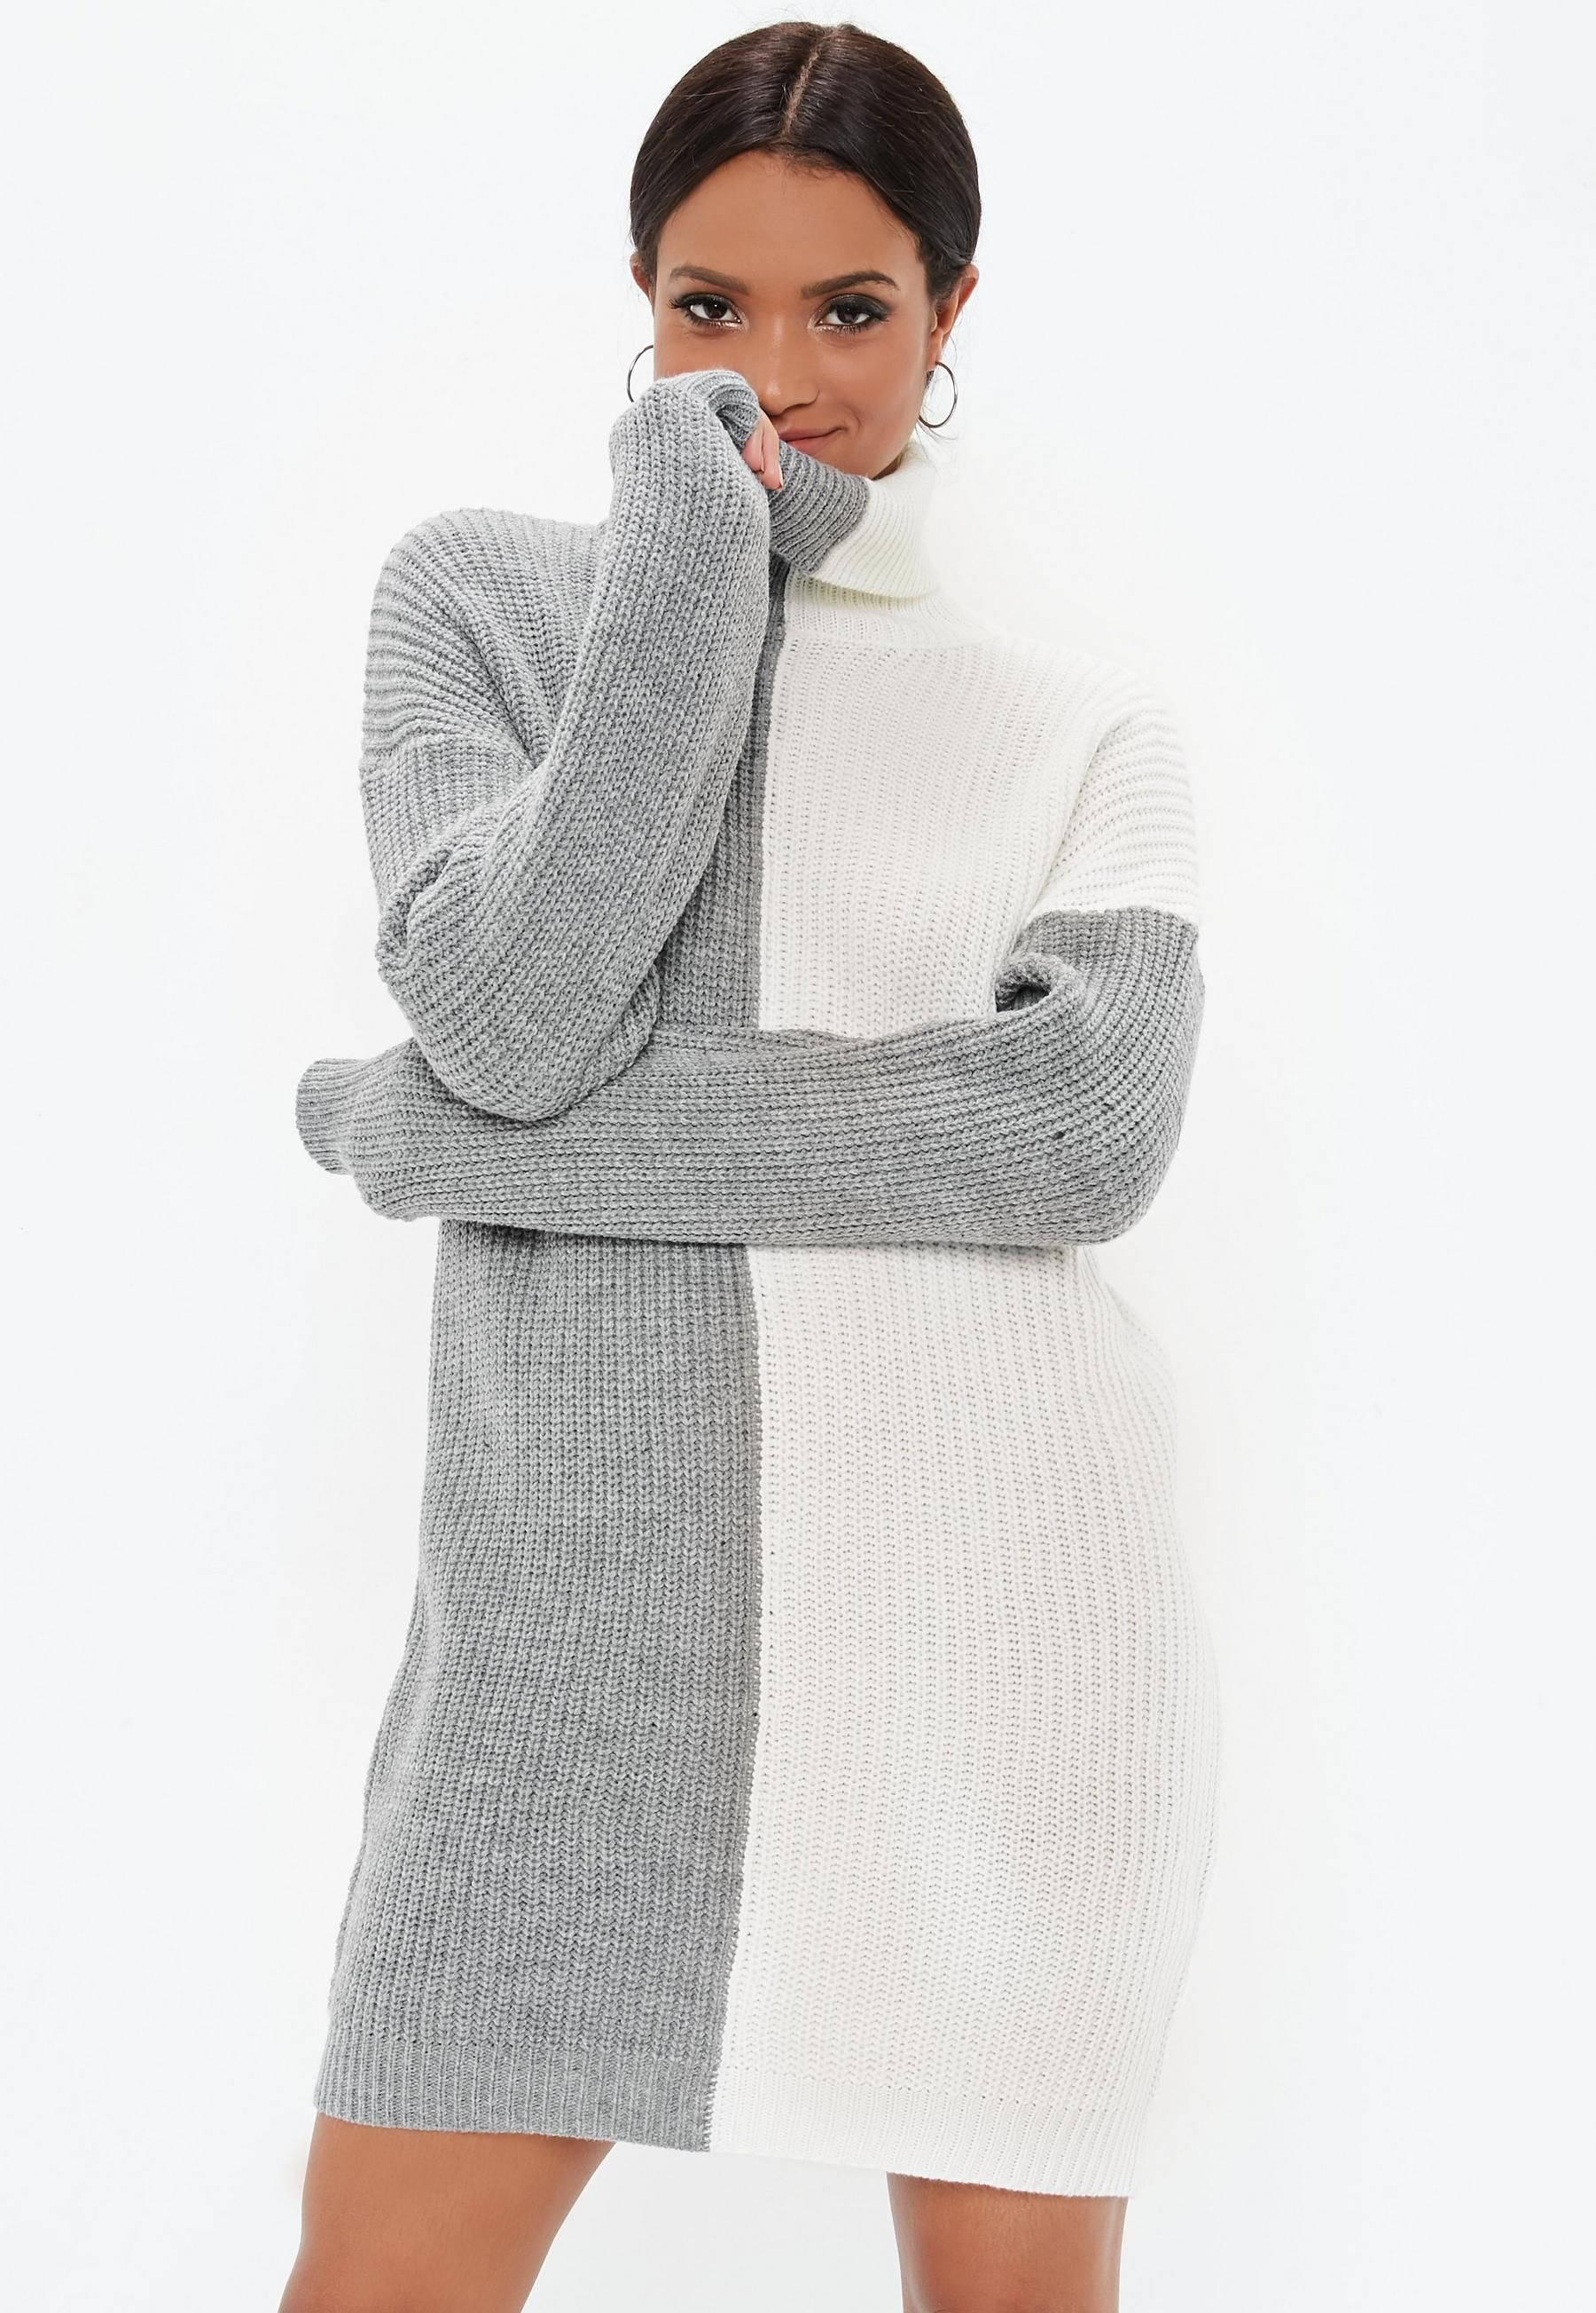 1e7659ed5531fc Missguided Tall Gray Turtle Neck Splice Sweater Dress in 2019 ...